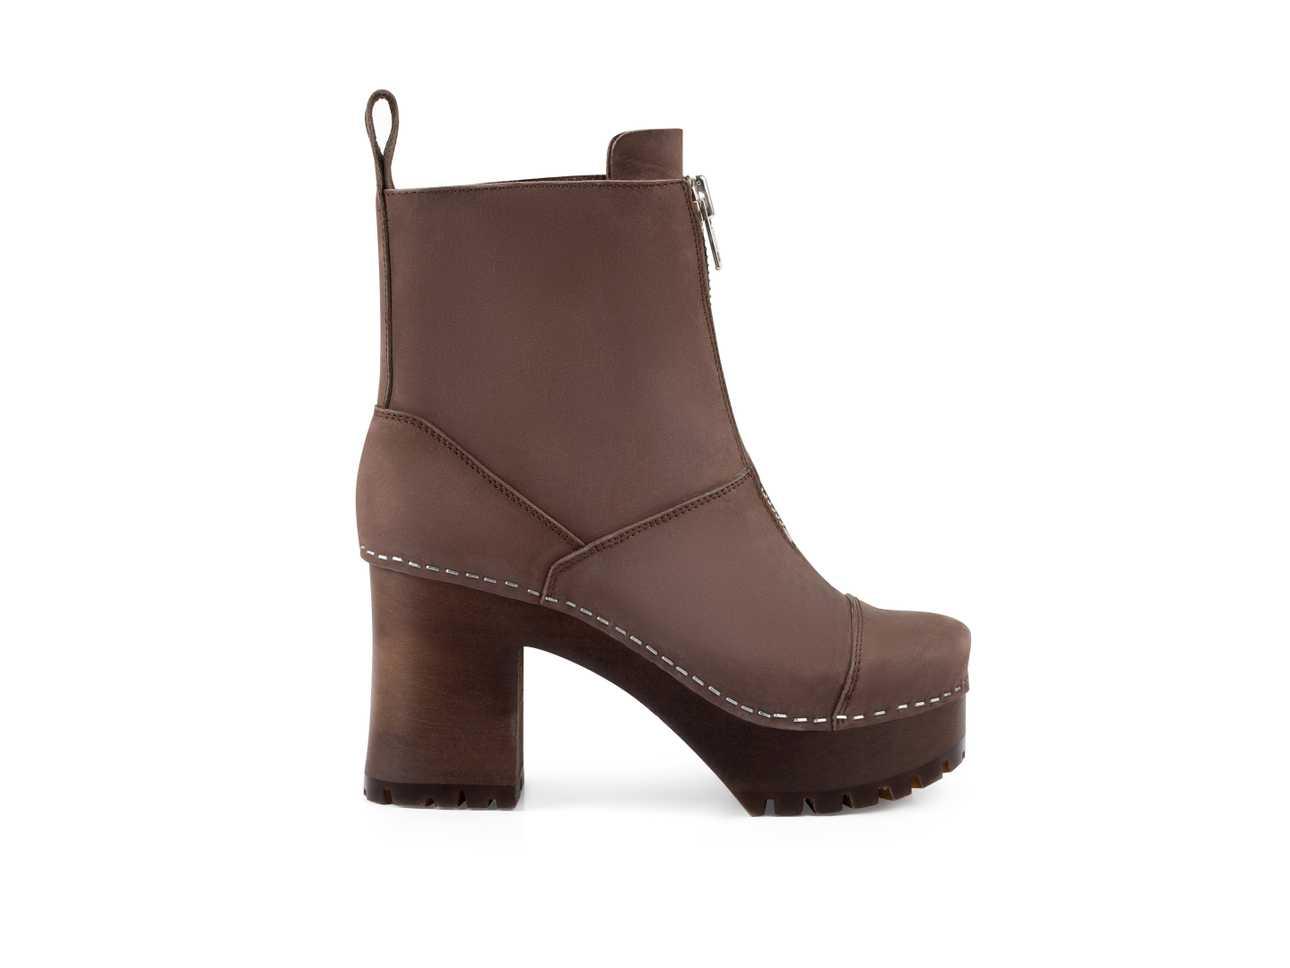 Grunge Boot Chocolate Brown Nubuck/Chocolate Brown